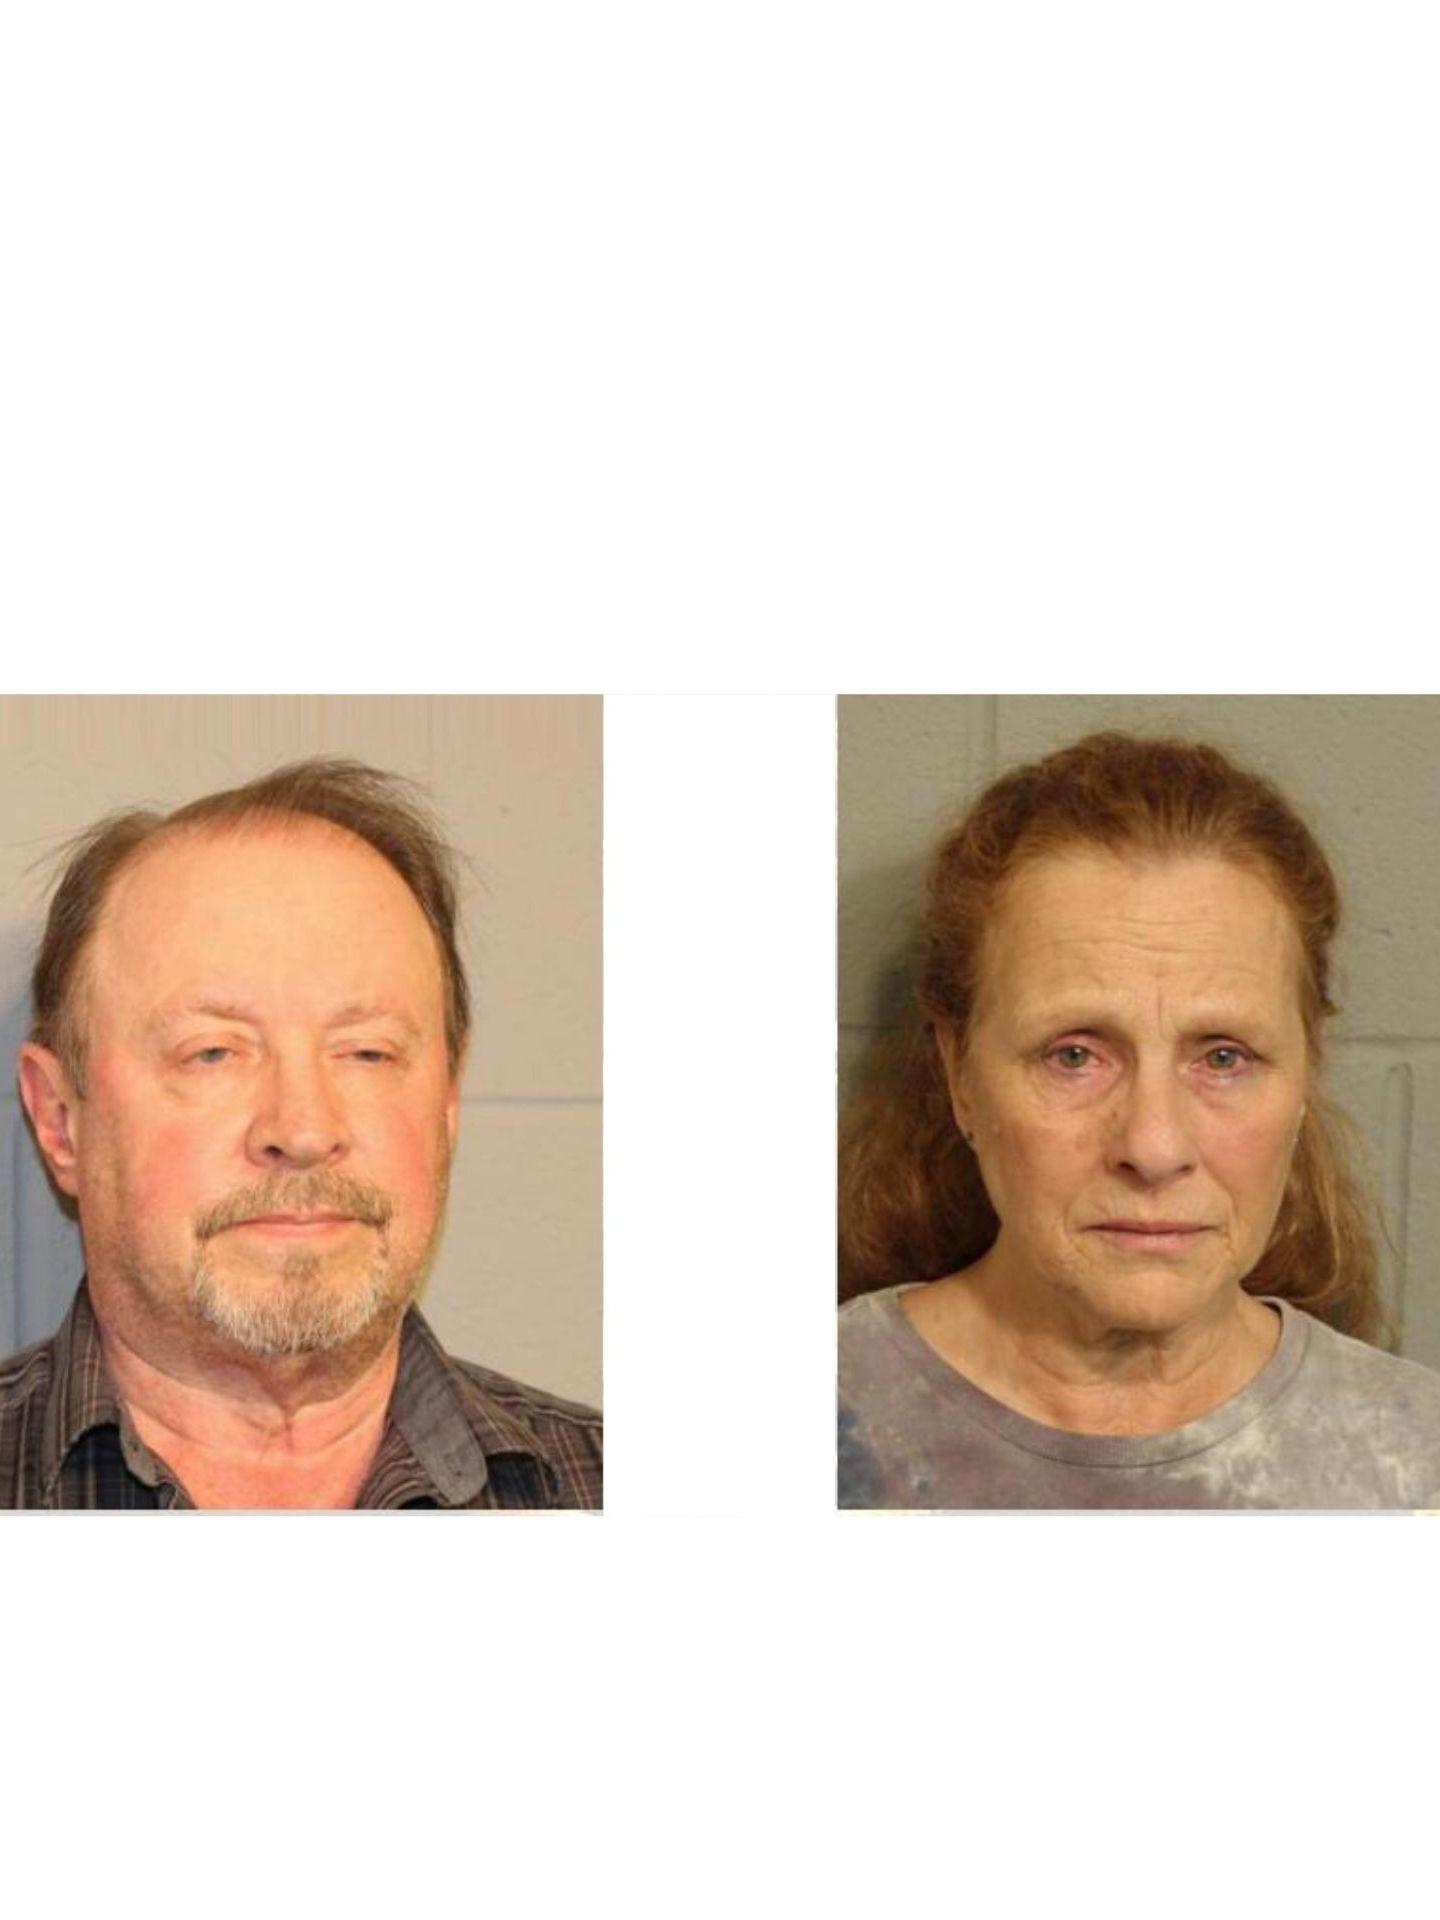 James K. Sheley, 62, (left) and Debra L. Sheley, 62